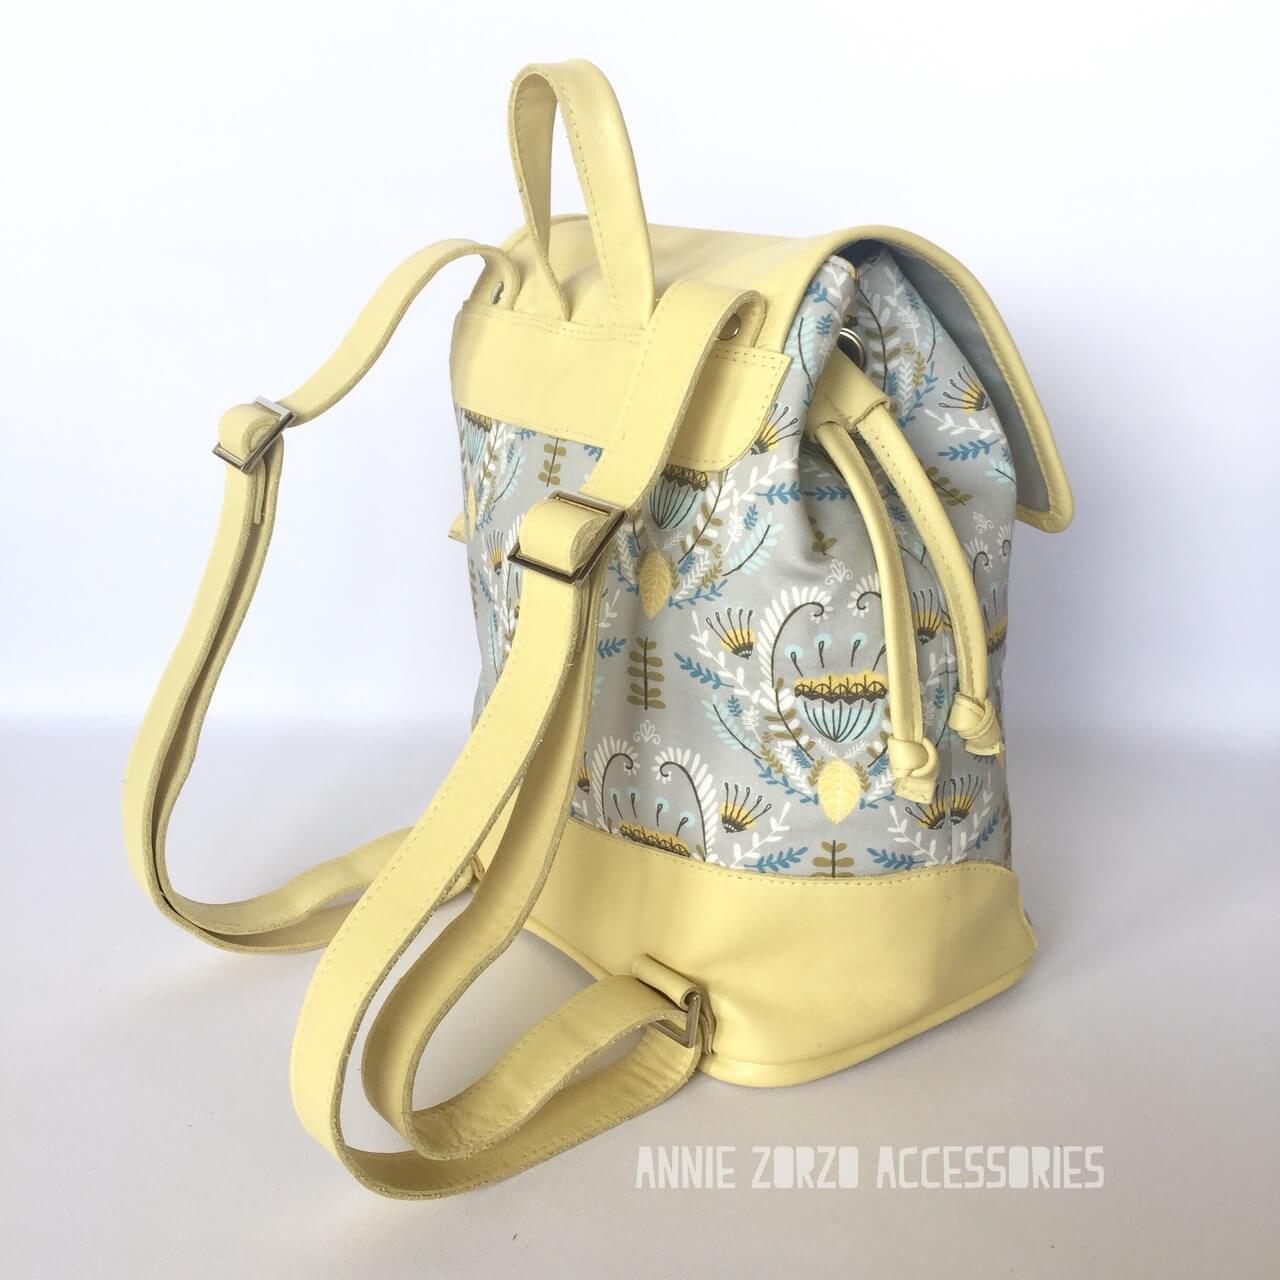 Urban Bucket Bag hacked into backpack